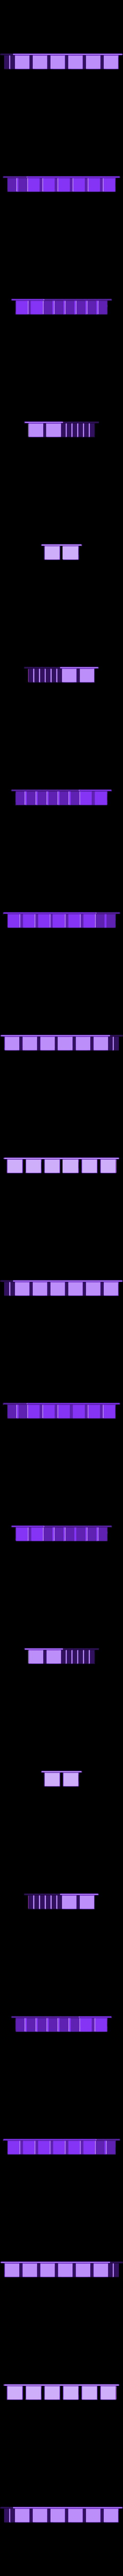 8ecfd7dc f1ce 4352 b623 0b0927dd0c30